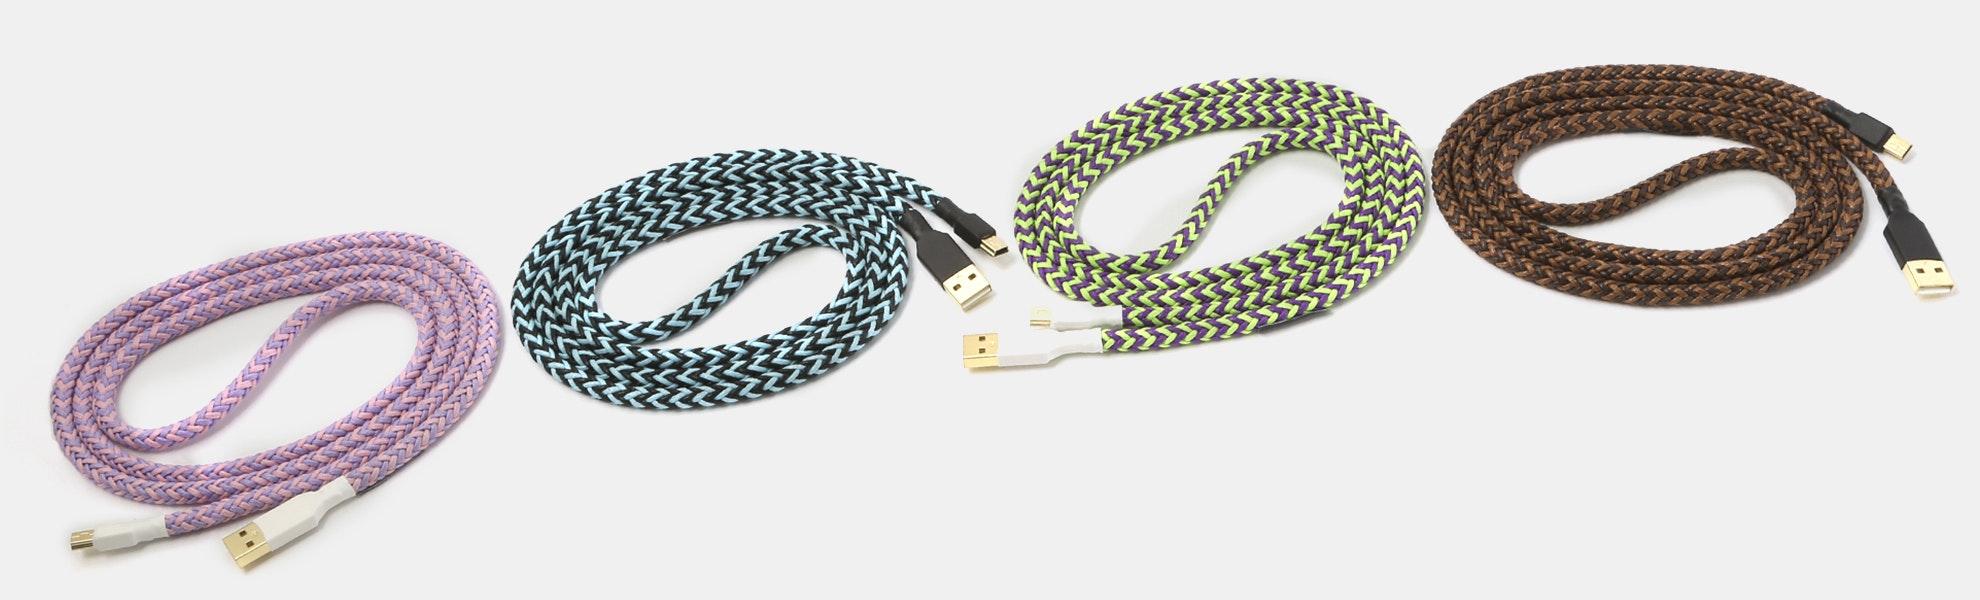 Keycap Themed Braided Nylon USB Cable